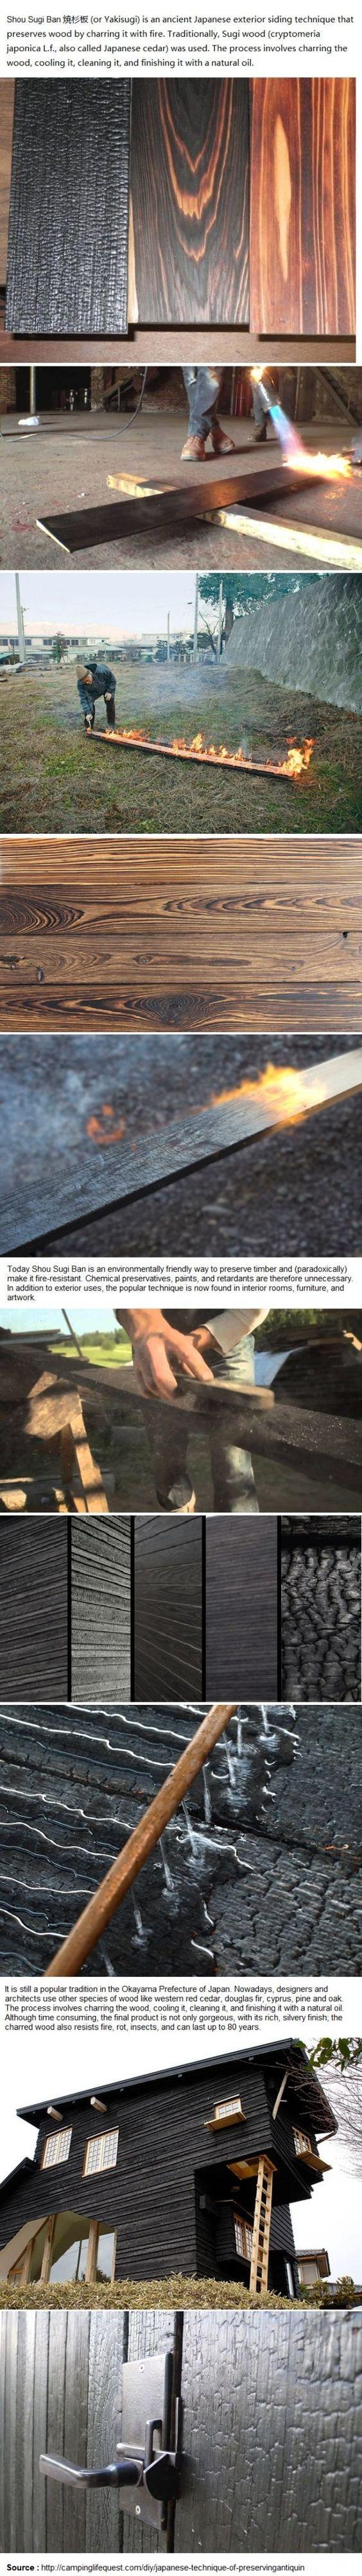 Japanese technique of preserving/antiquing wood – Duncan Johnston